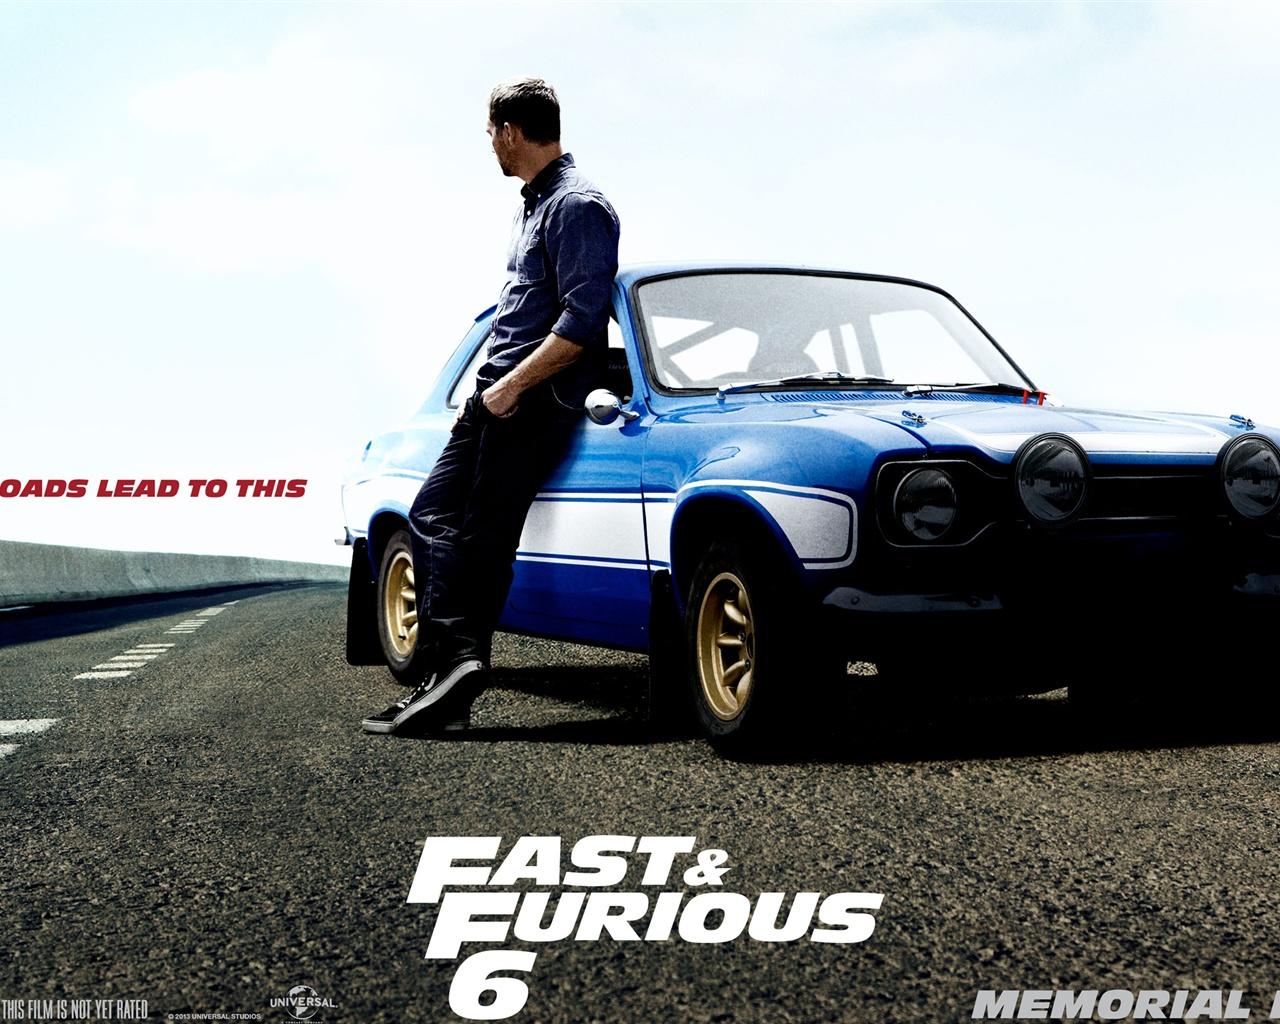 Download Wallpaper 1280x1024 Paul Walker in Fast and ...